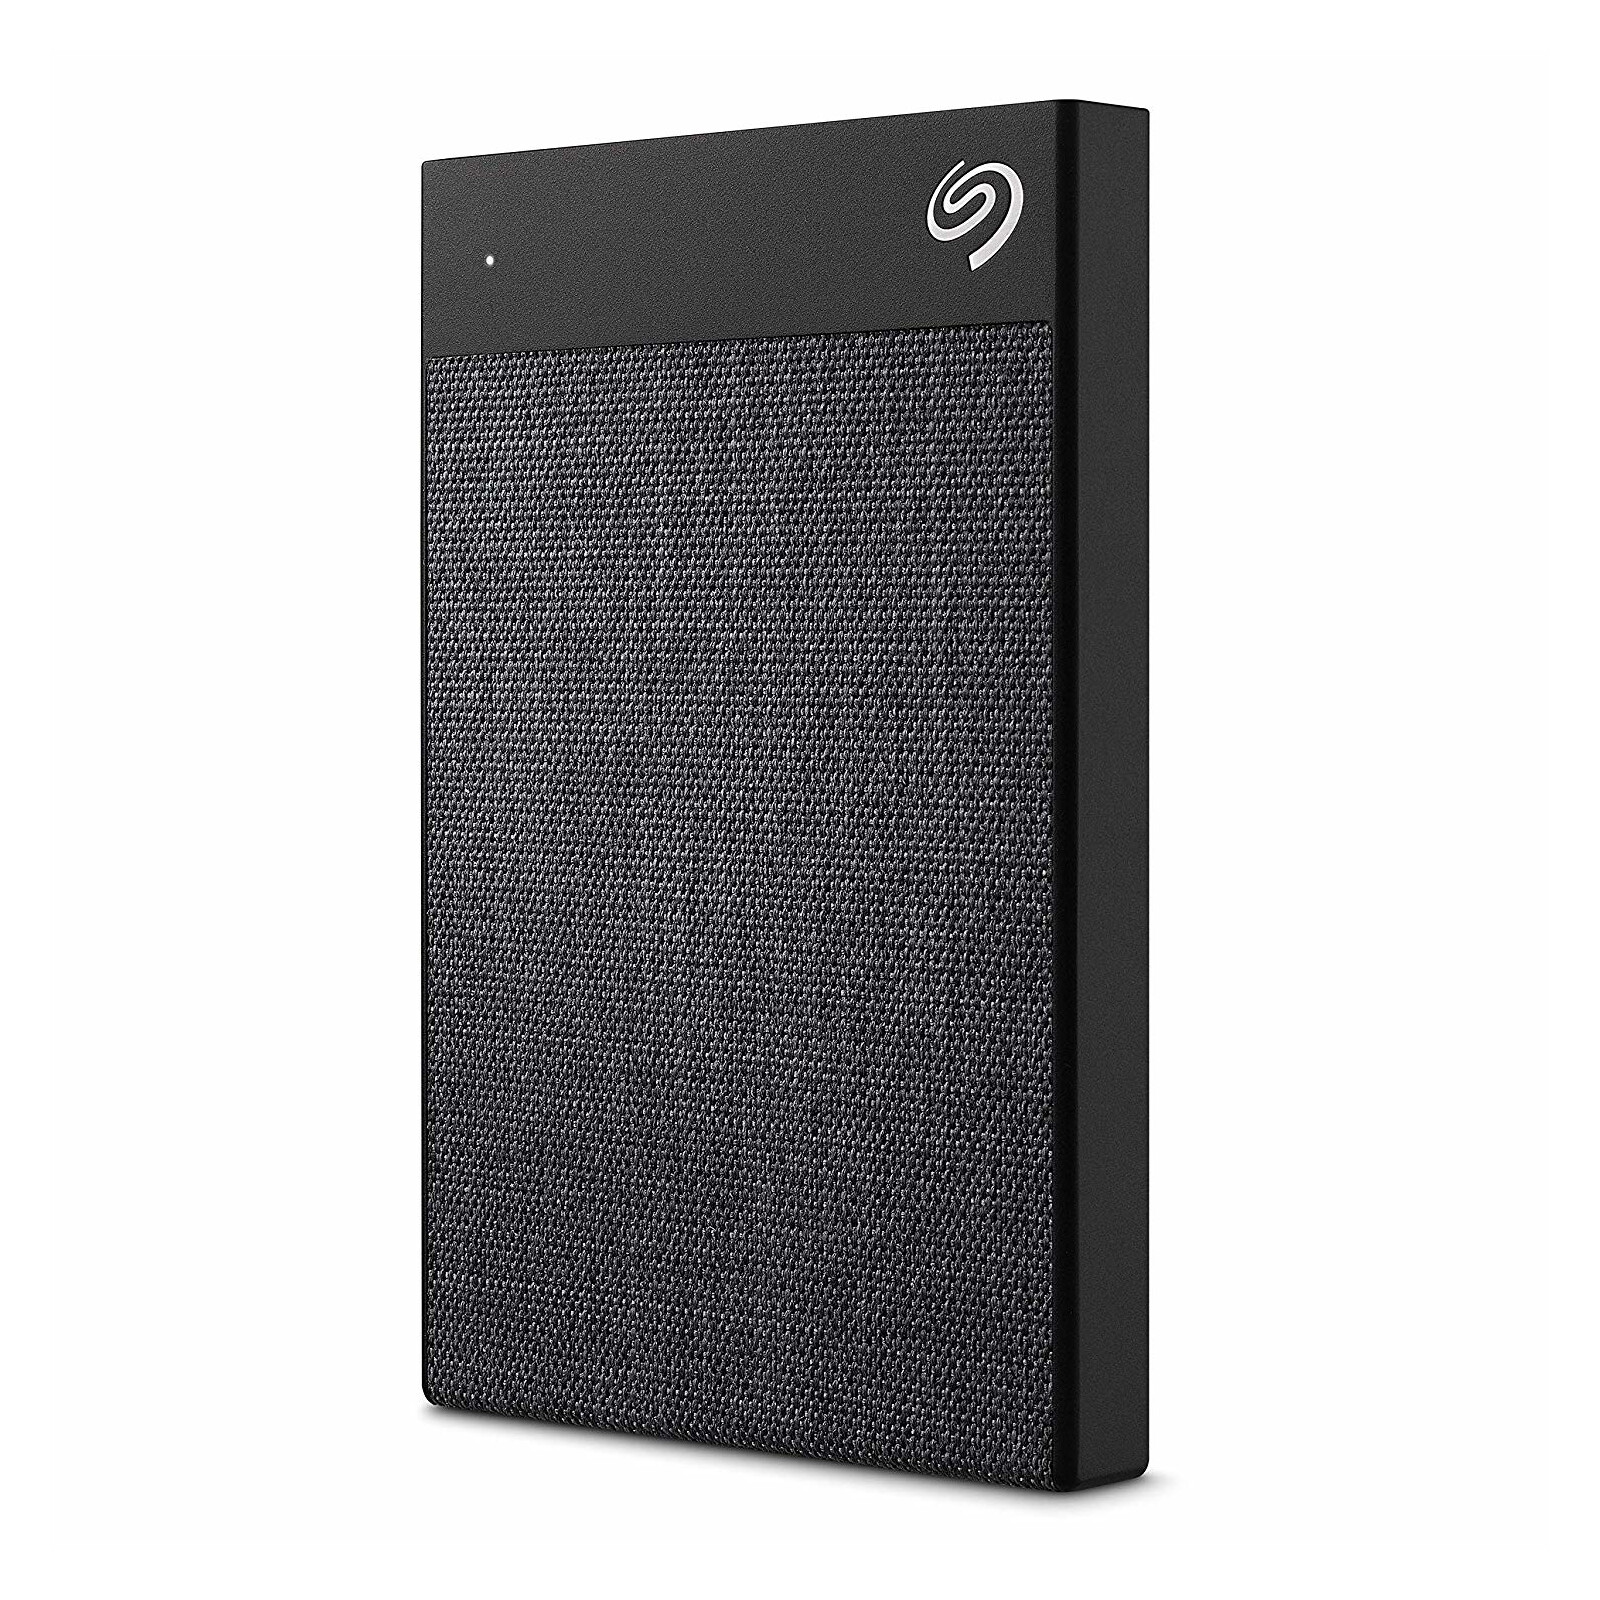 Seagate HDD Backup Ultra 2TB schwarz